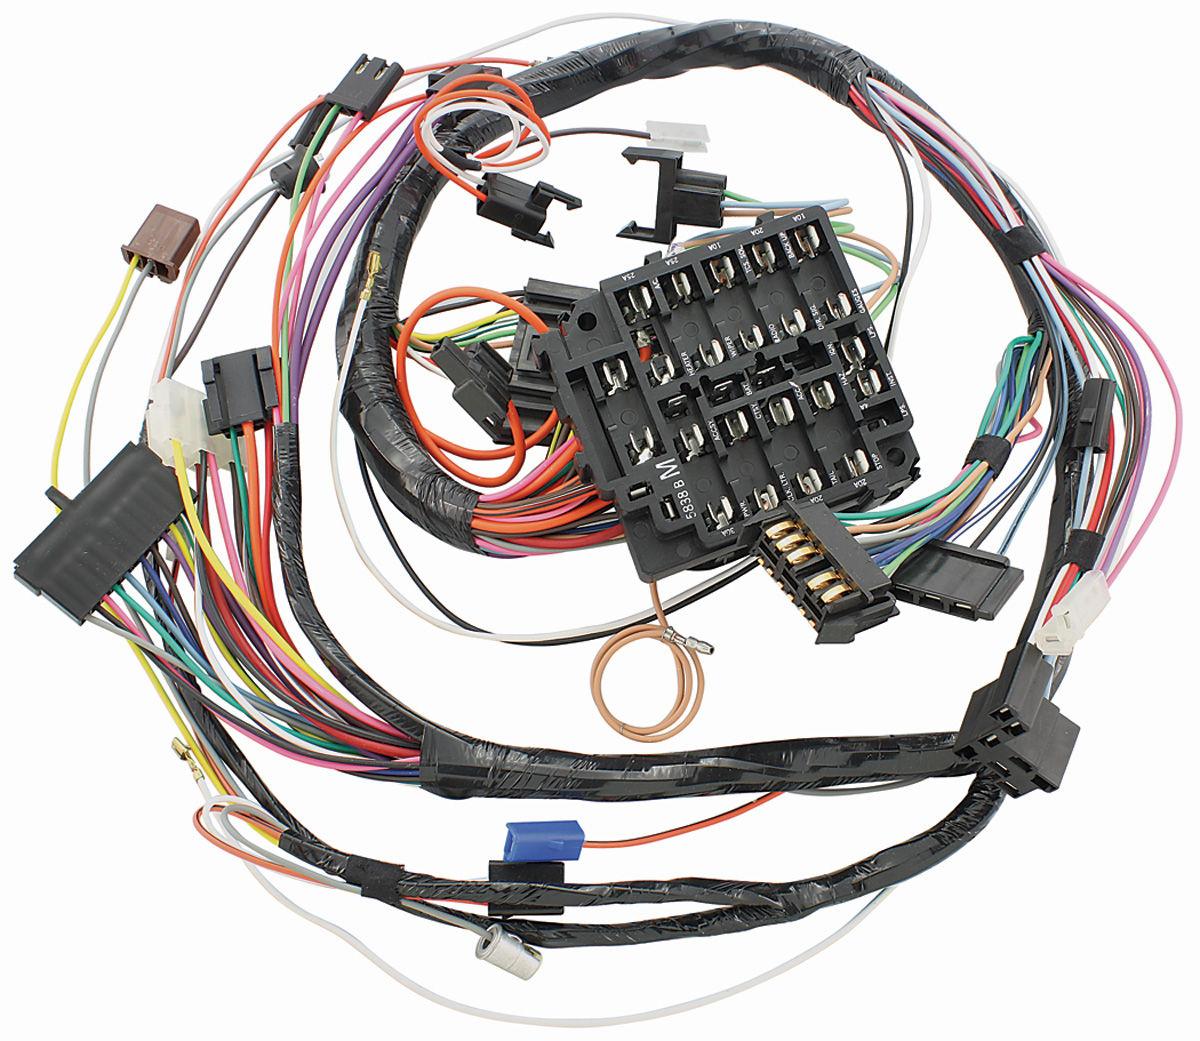 1971 gto wiring harness